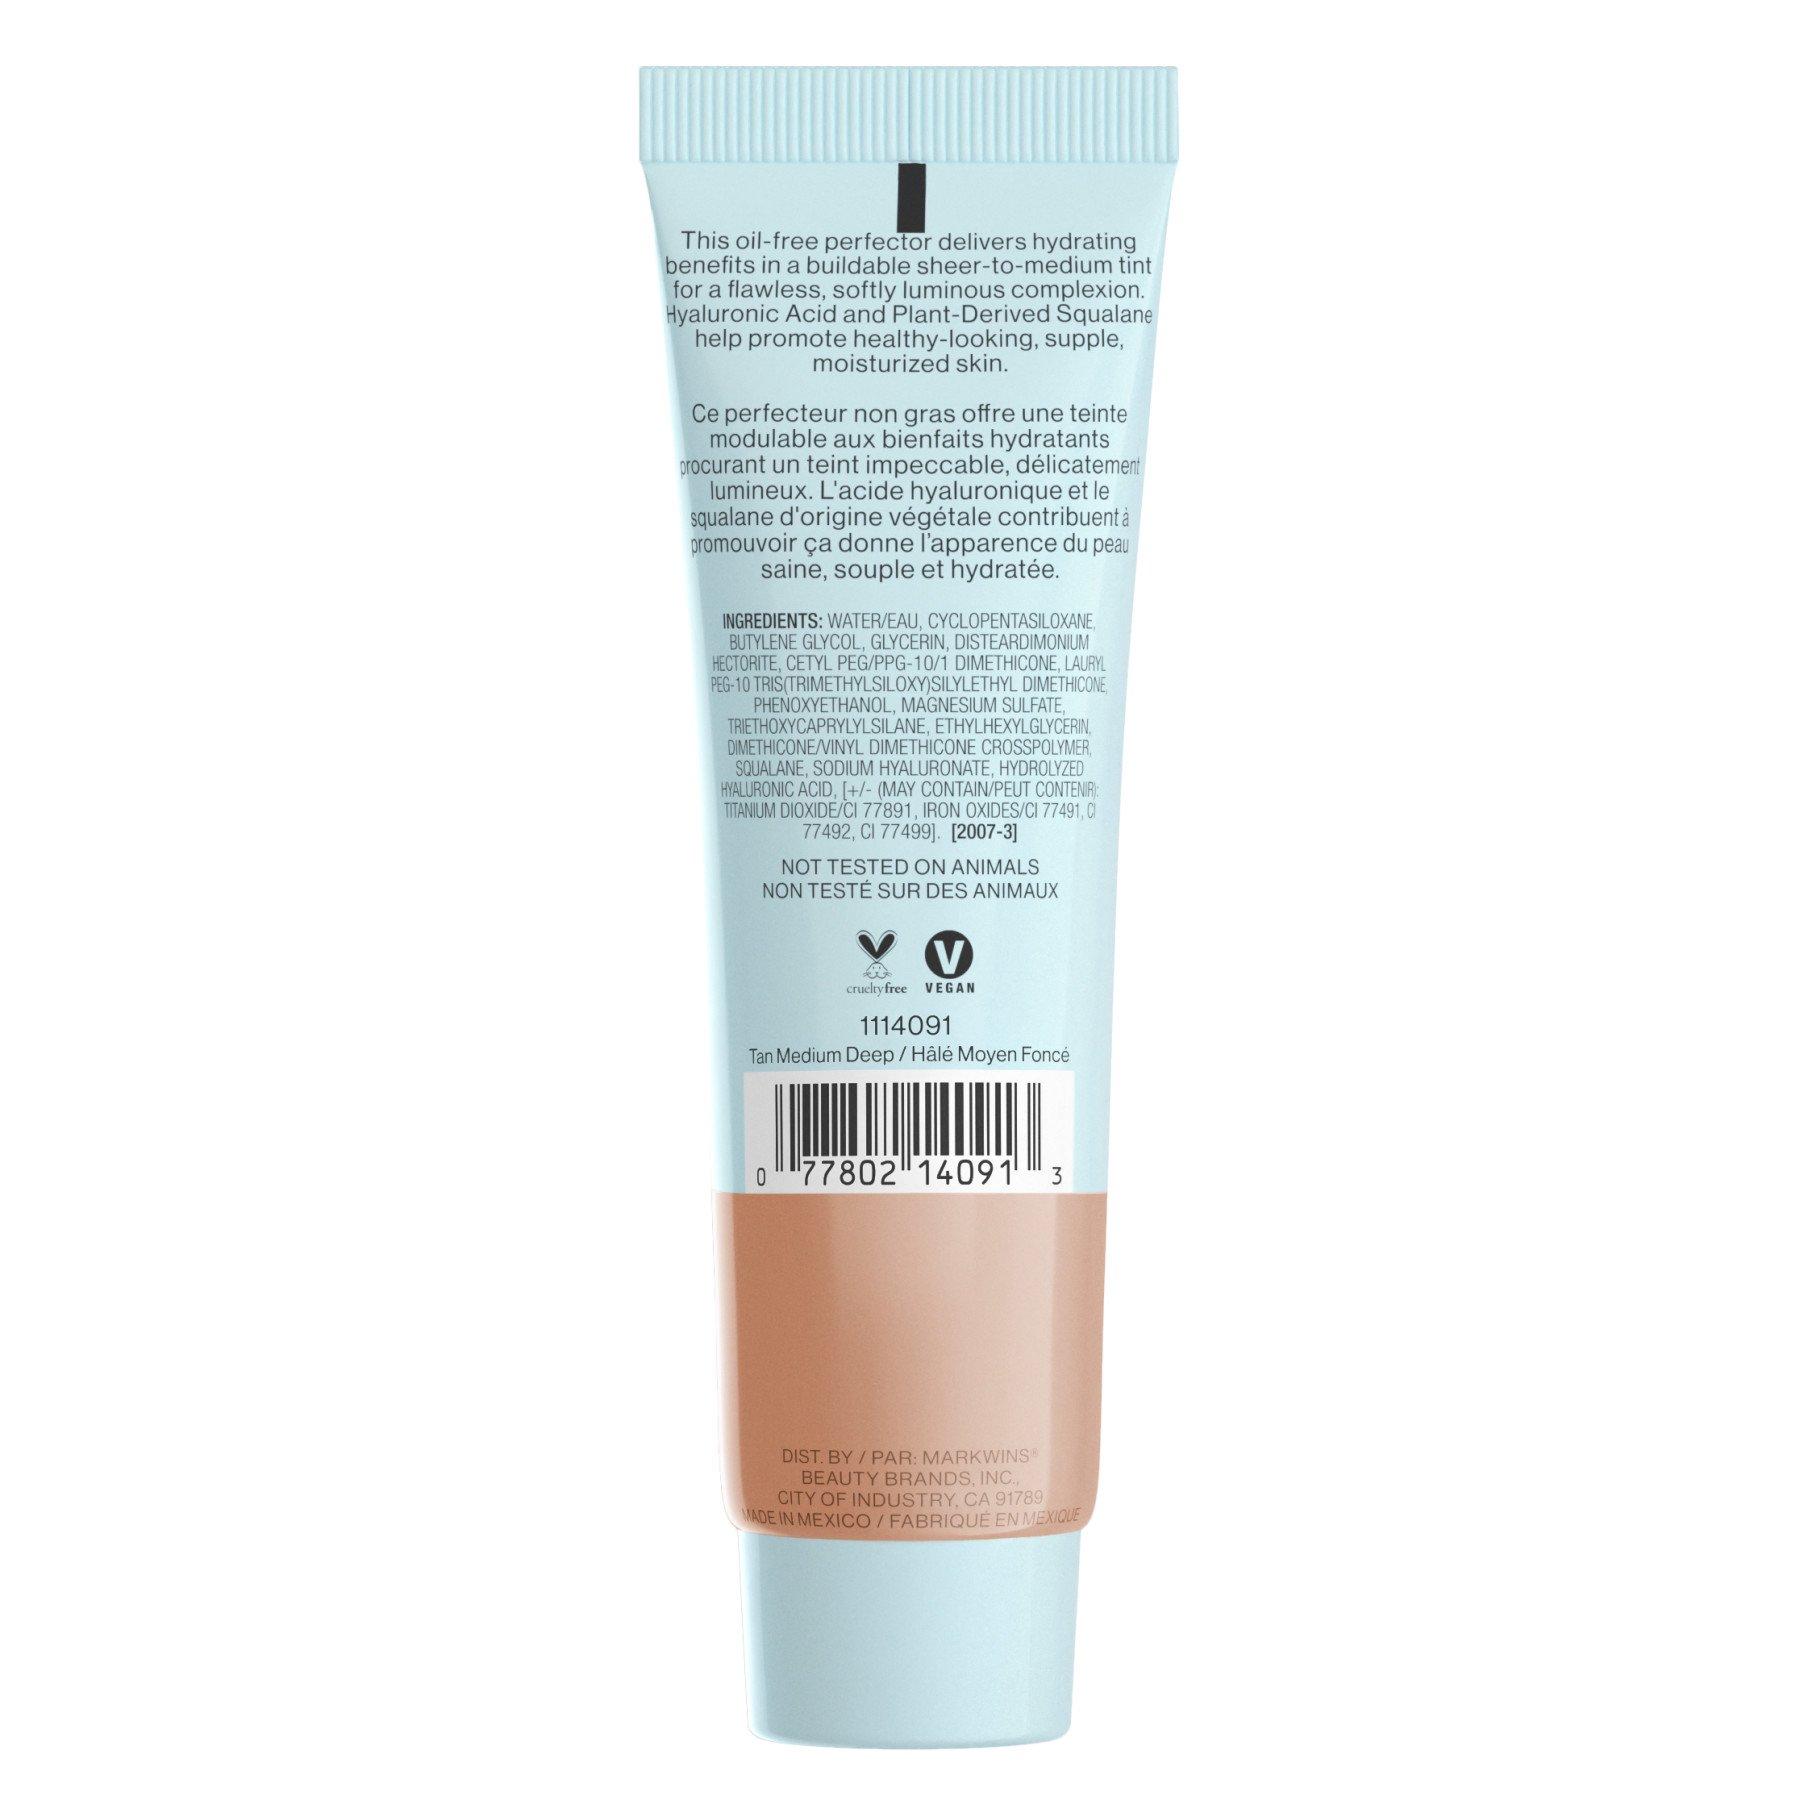 Wet n Wild BareFocus Tinted Hydrator Skin Veil